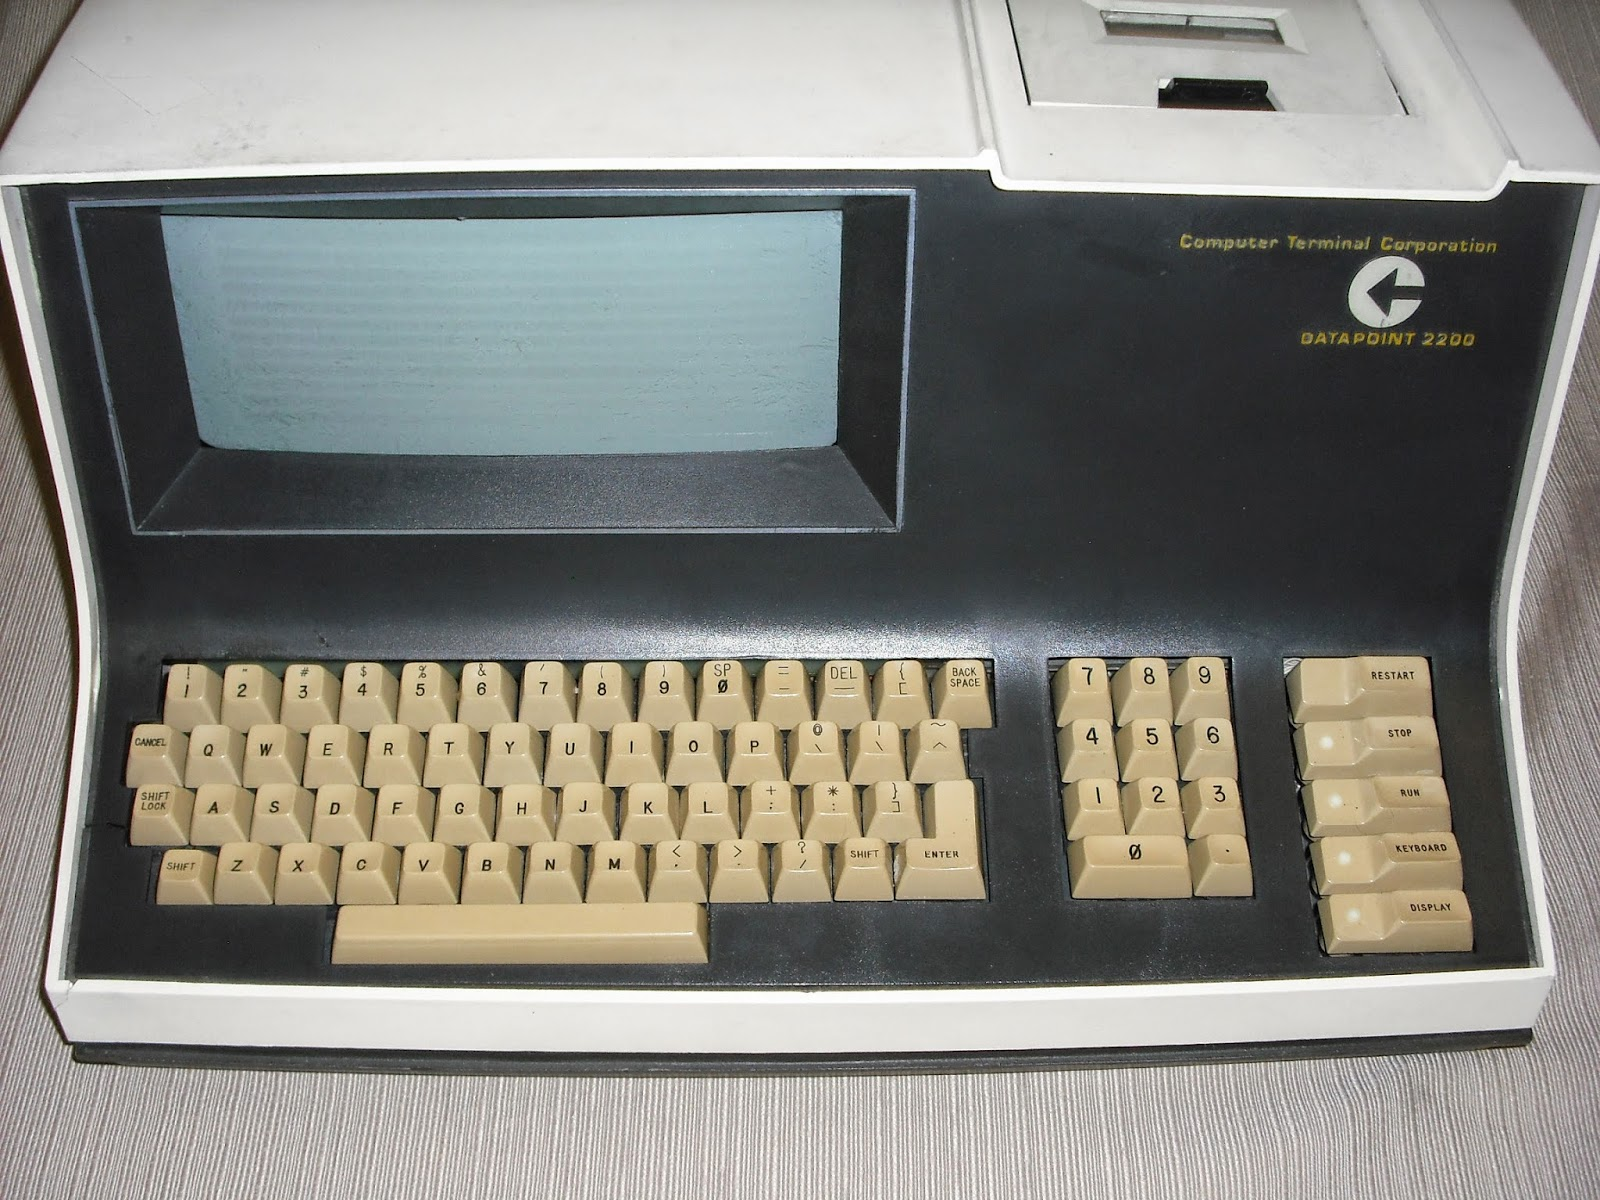 CTC2200 data terminal